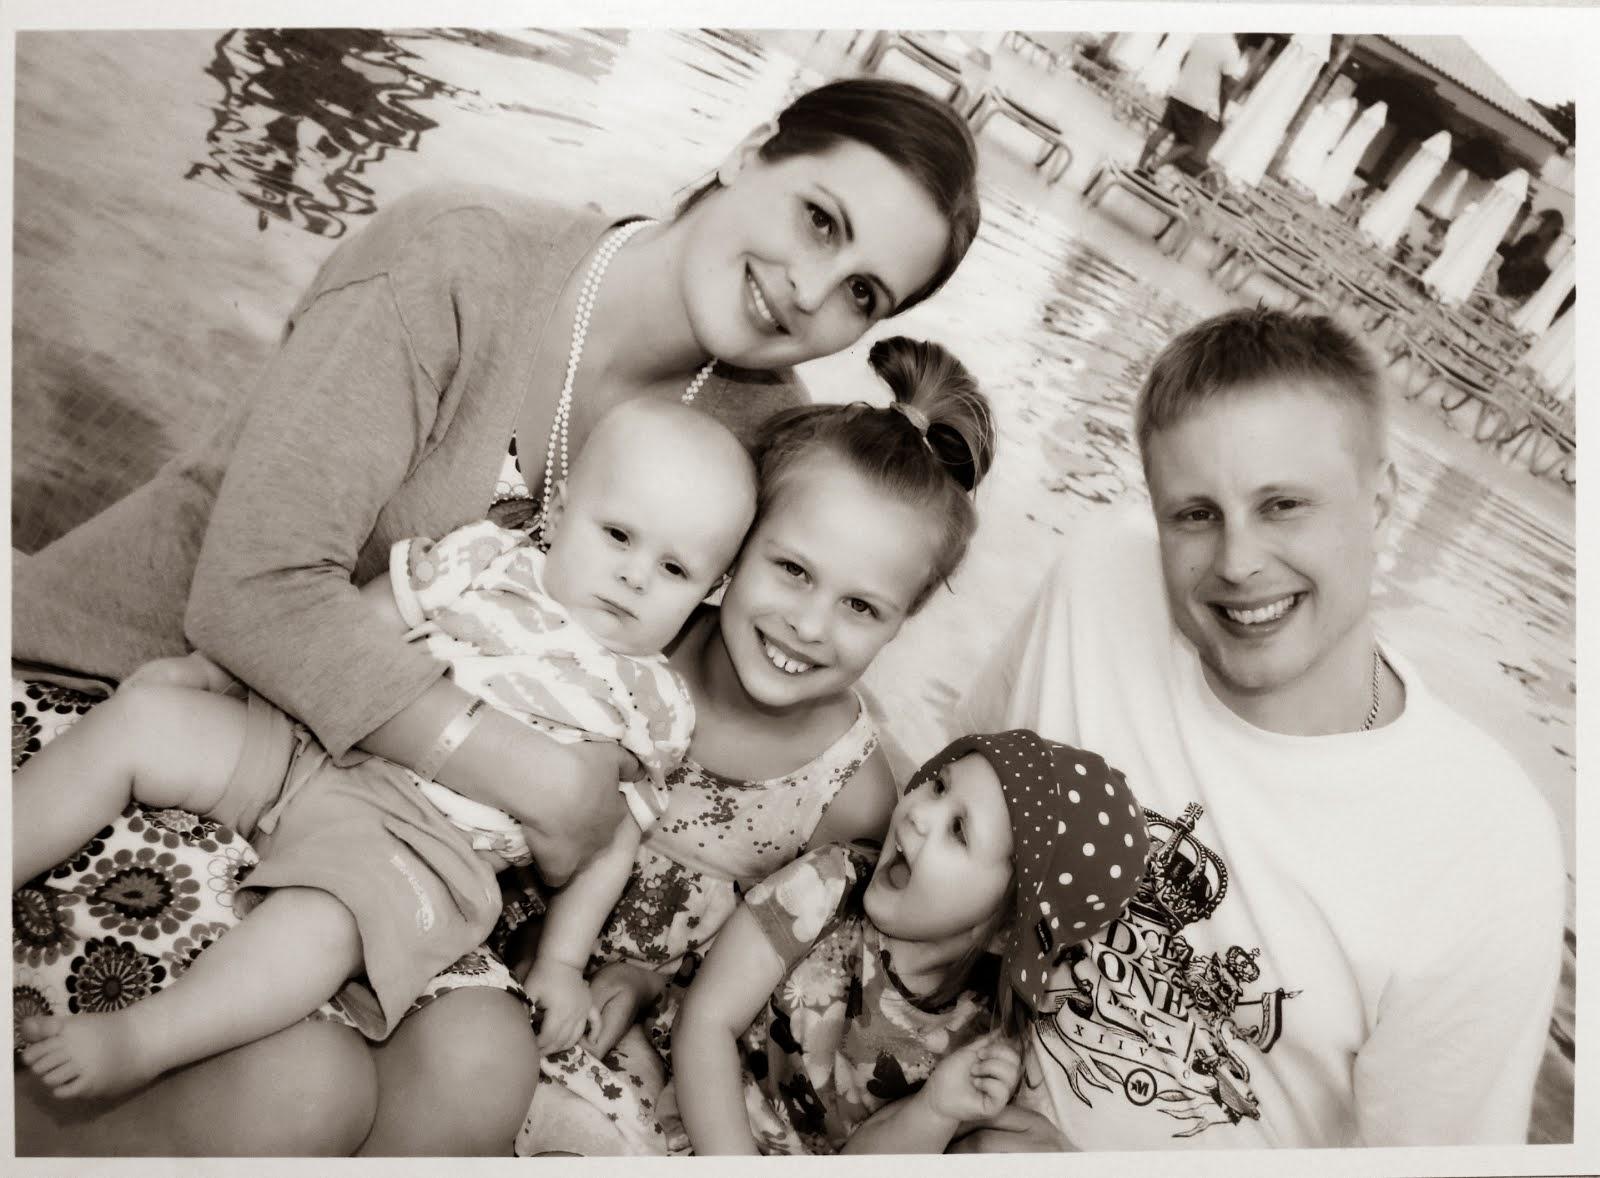 Meidän perhe